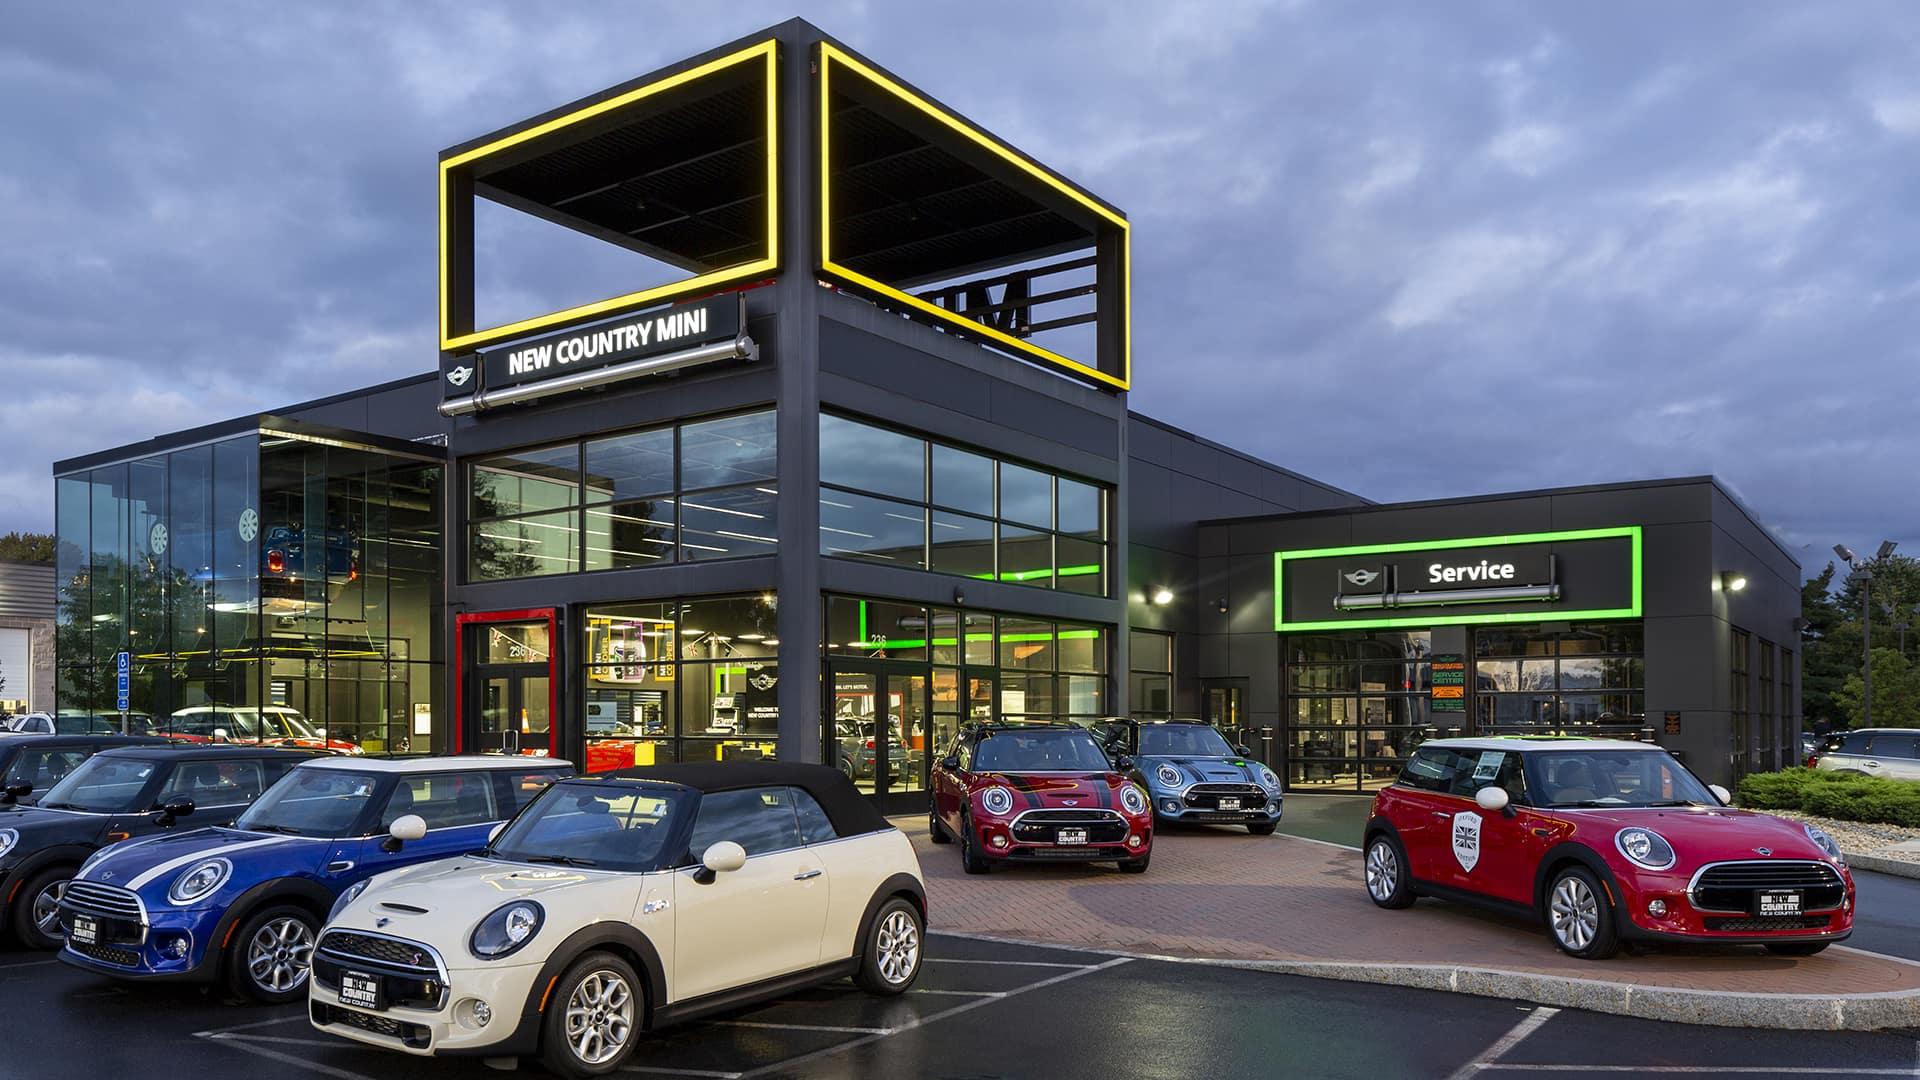 exterior shot of dealership